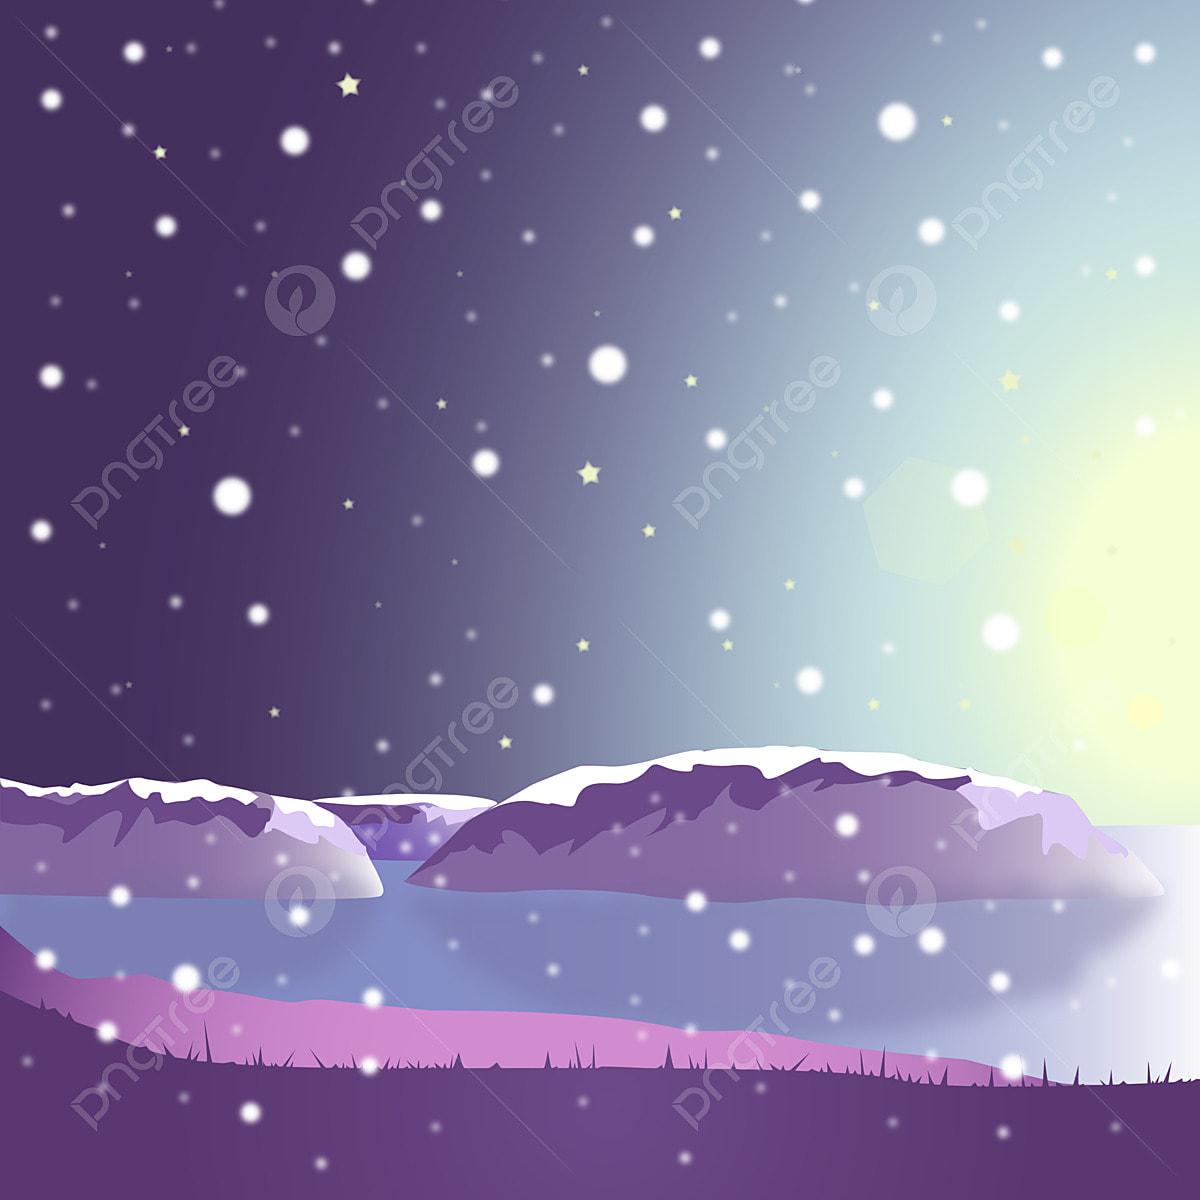 Estetikisme Ungu Hari Salji Angin Kartun Pemandangan Indah